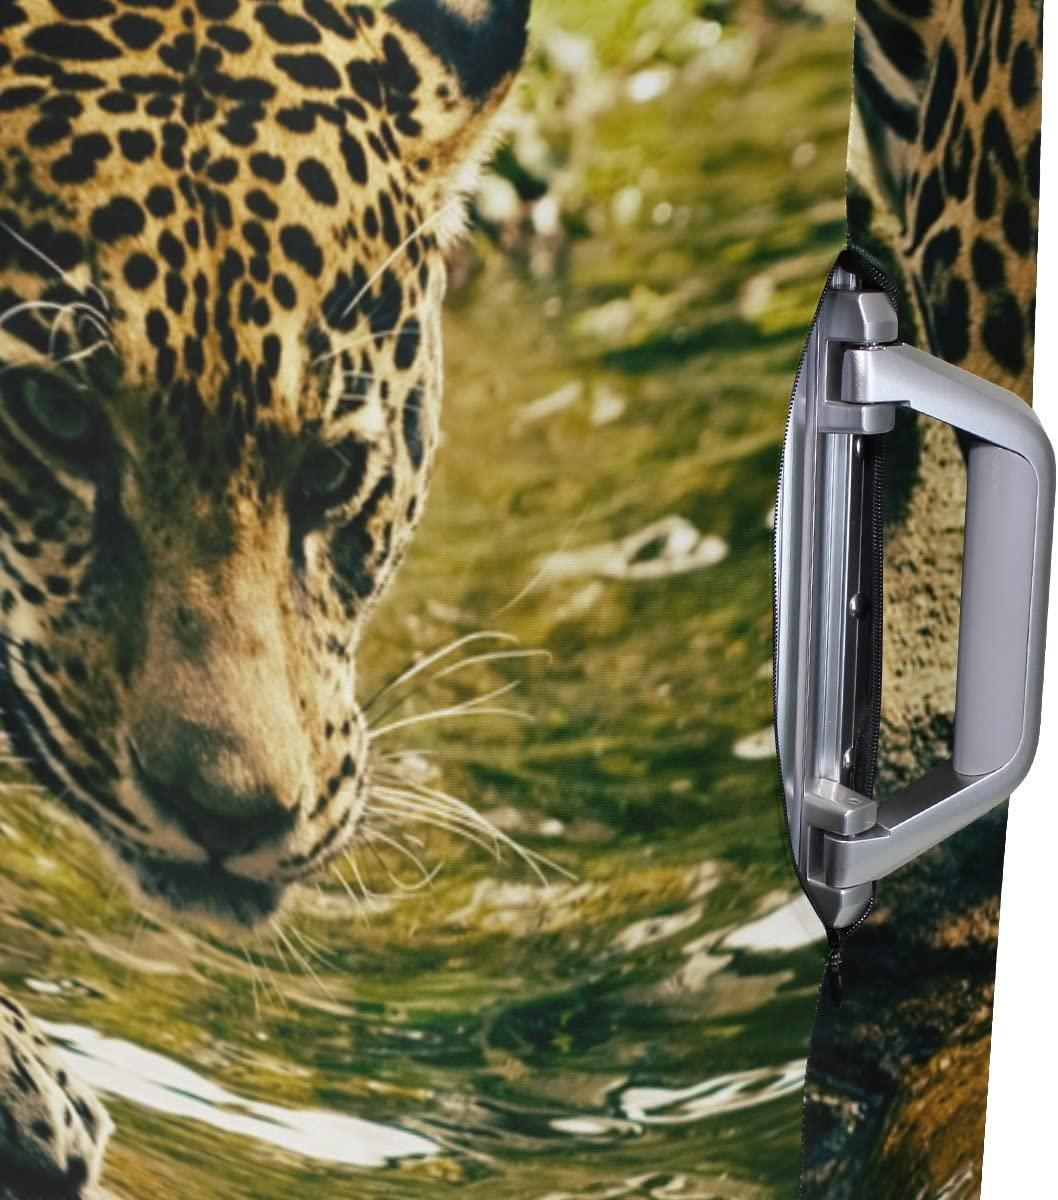 OREZI 3D Nature Leo On Stone Luggage Protector Suitcase Cover 18-32 Inch